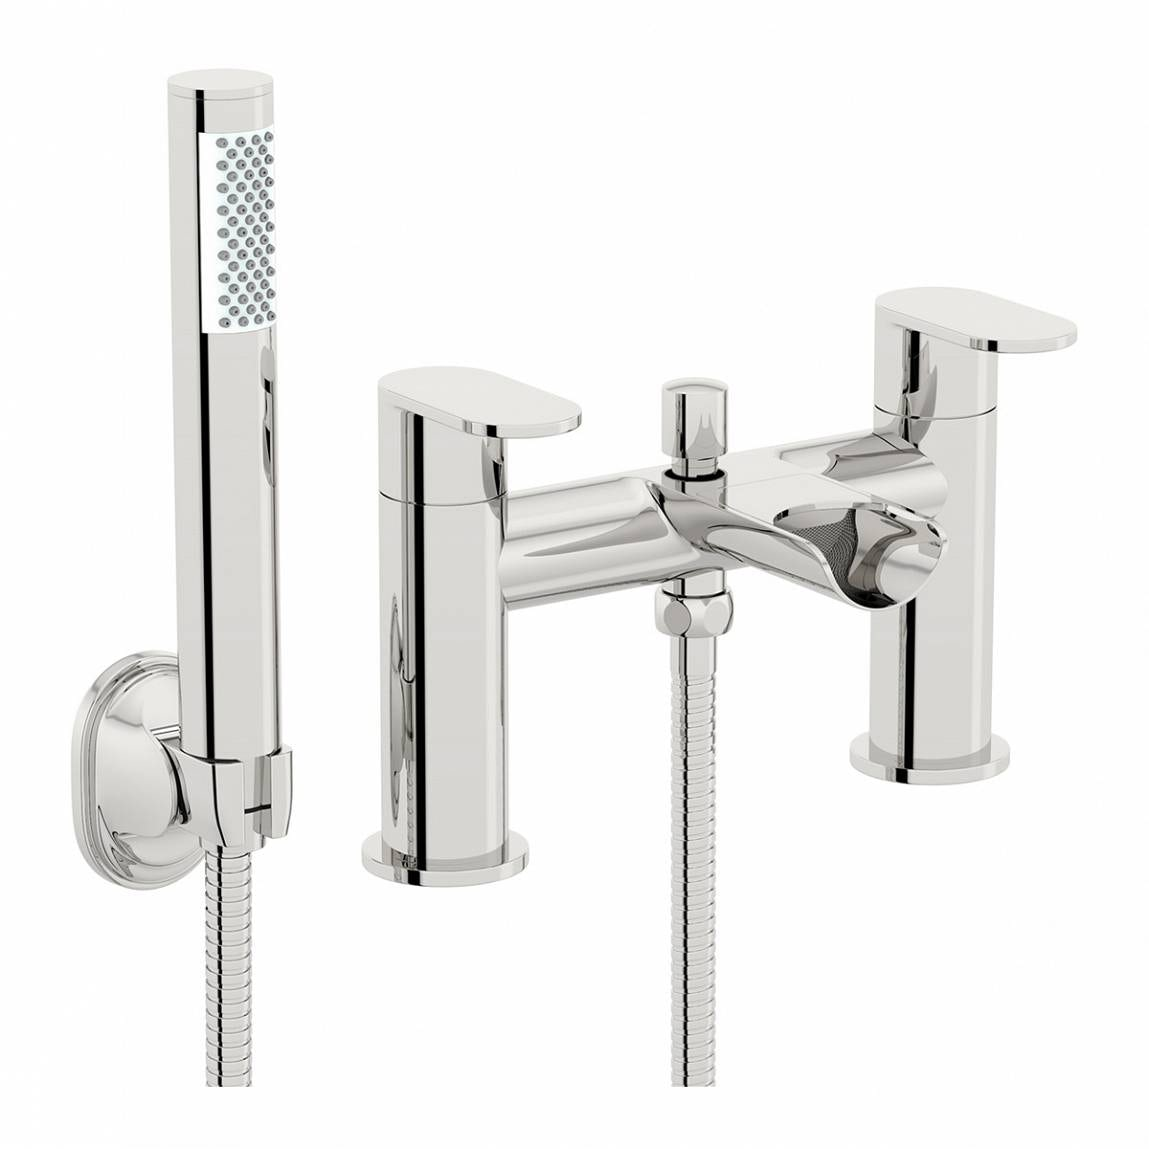 Orchard Eden waterfall bath shower mixer tap